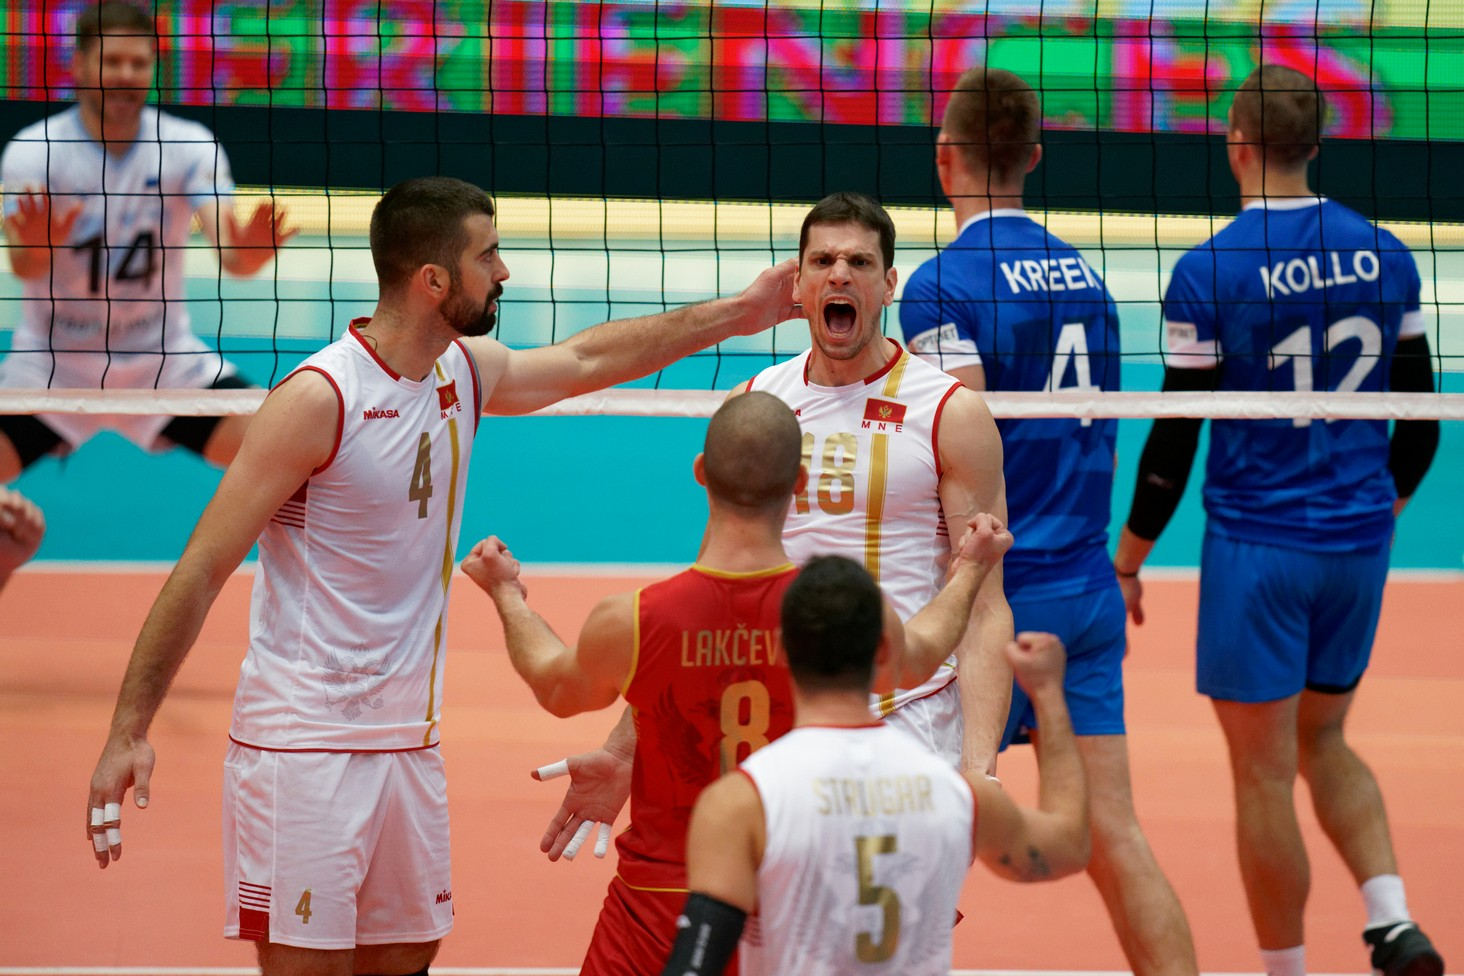 crna gora estonija seniori reprezentacija odbojkasi evropsko prvenstvo 017